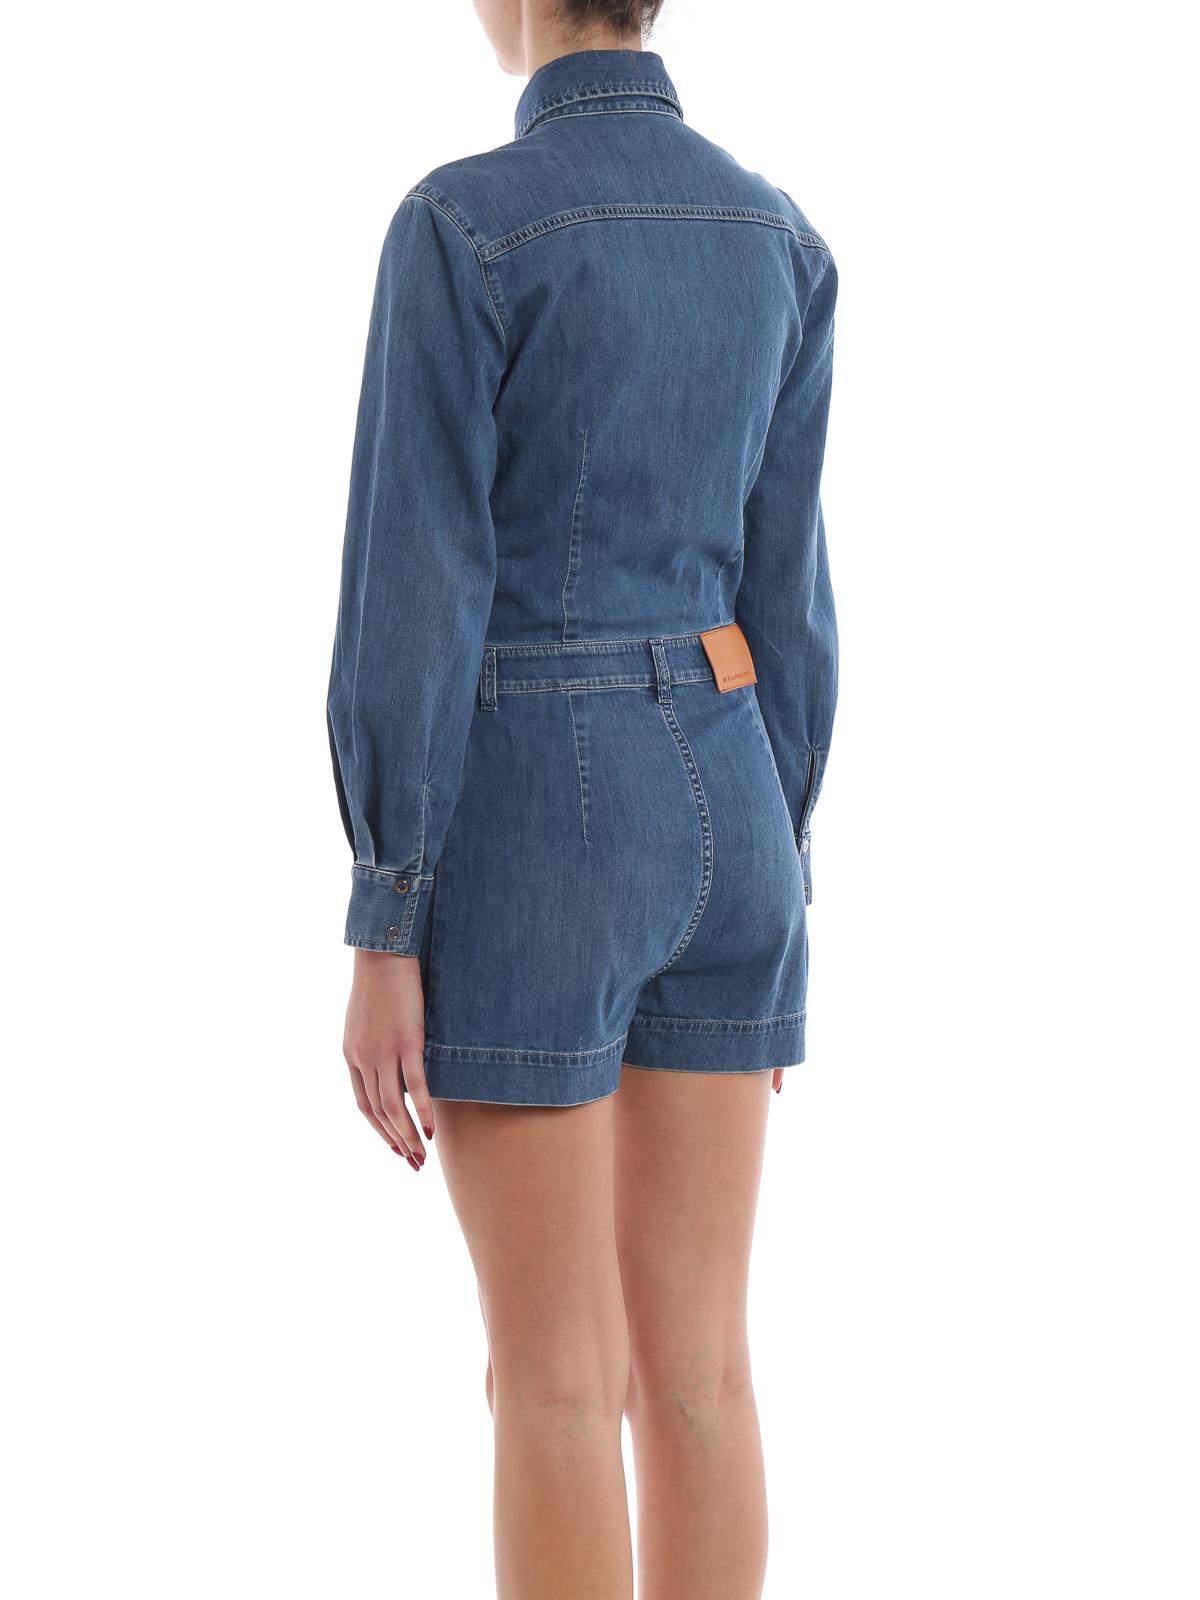 cb688136d0727 Stella Mccartney - Denim long sleeve short romper - jumpsuits ...